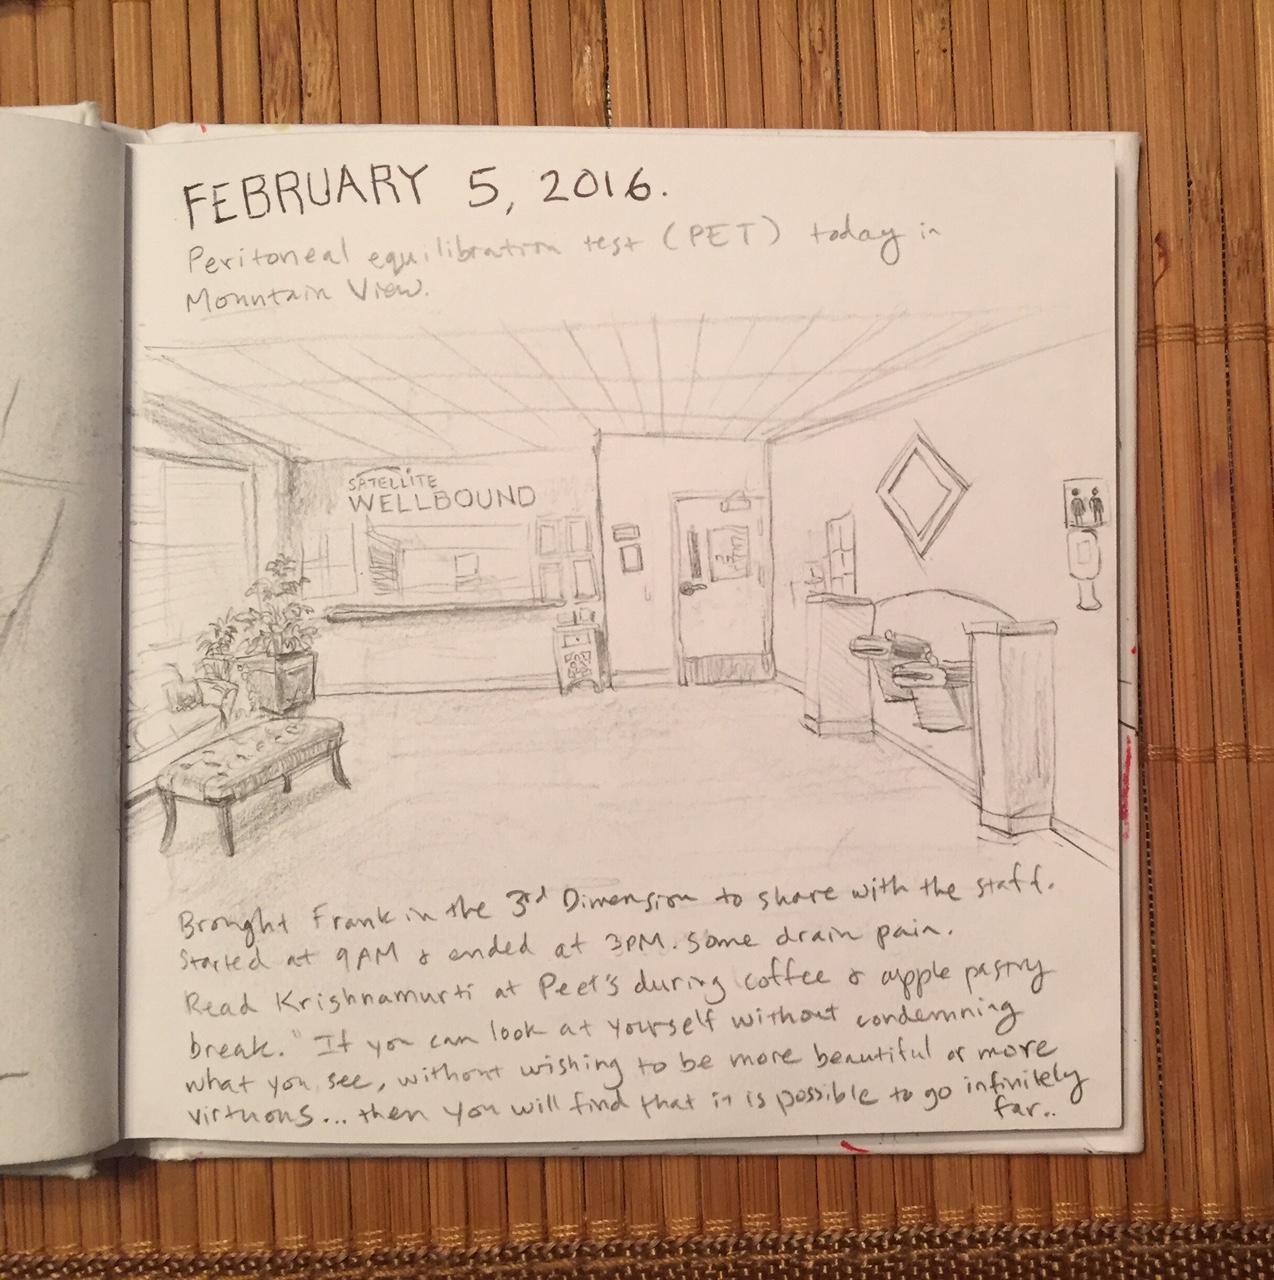 Sketching the waiting room at Satellite Wellbound.